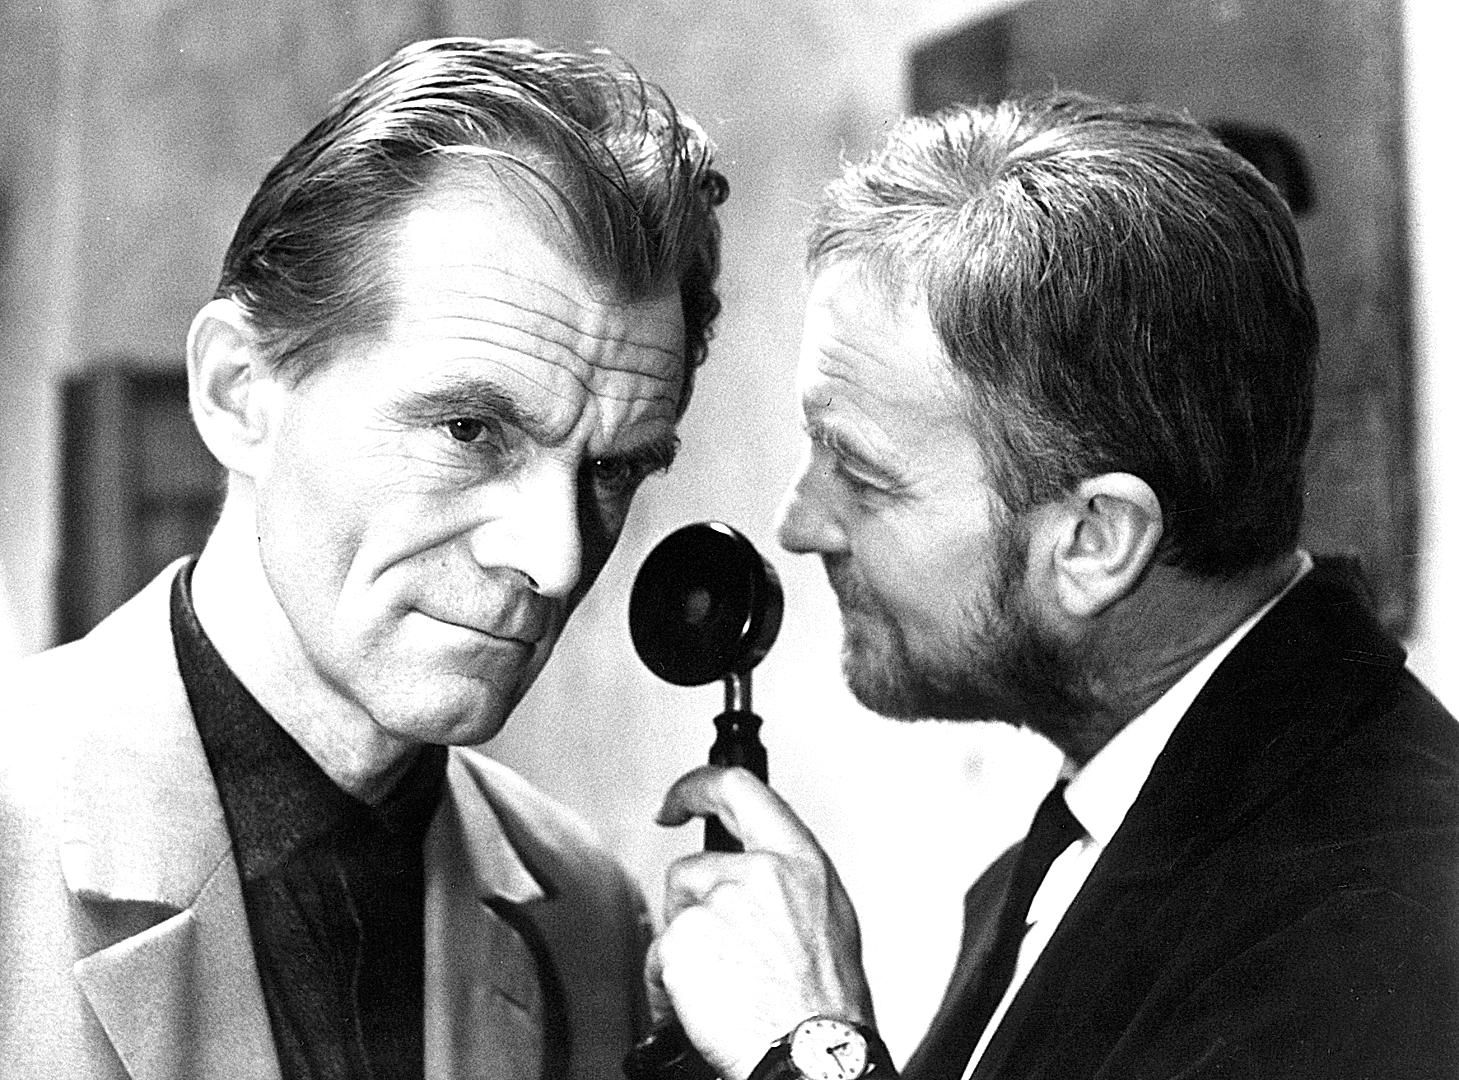 Radovan Lukavský and Miroslav Machácek in Pet miliónu svedku (1965)